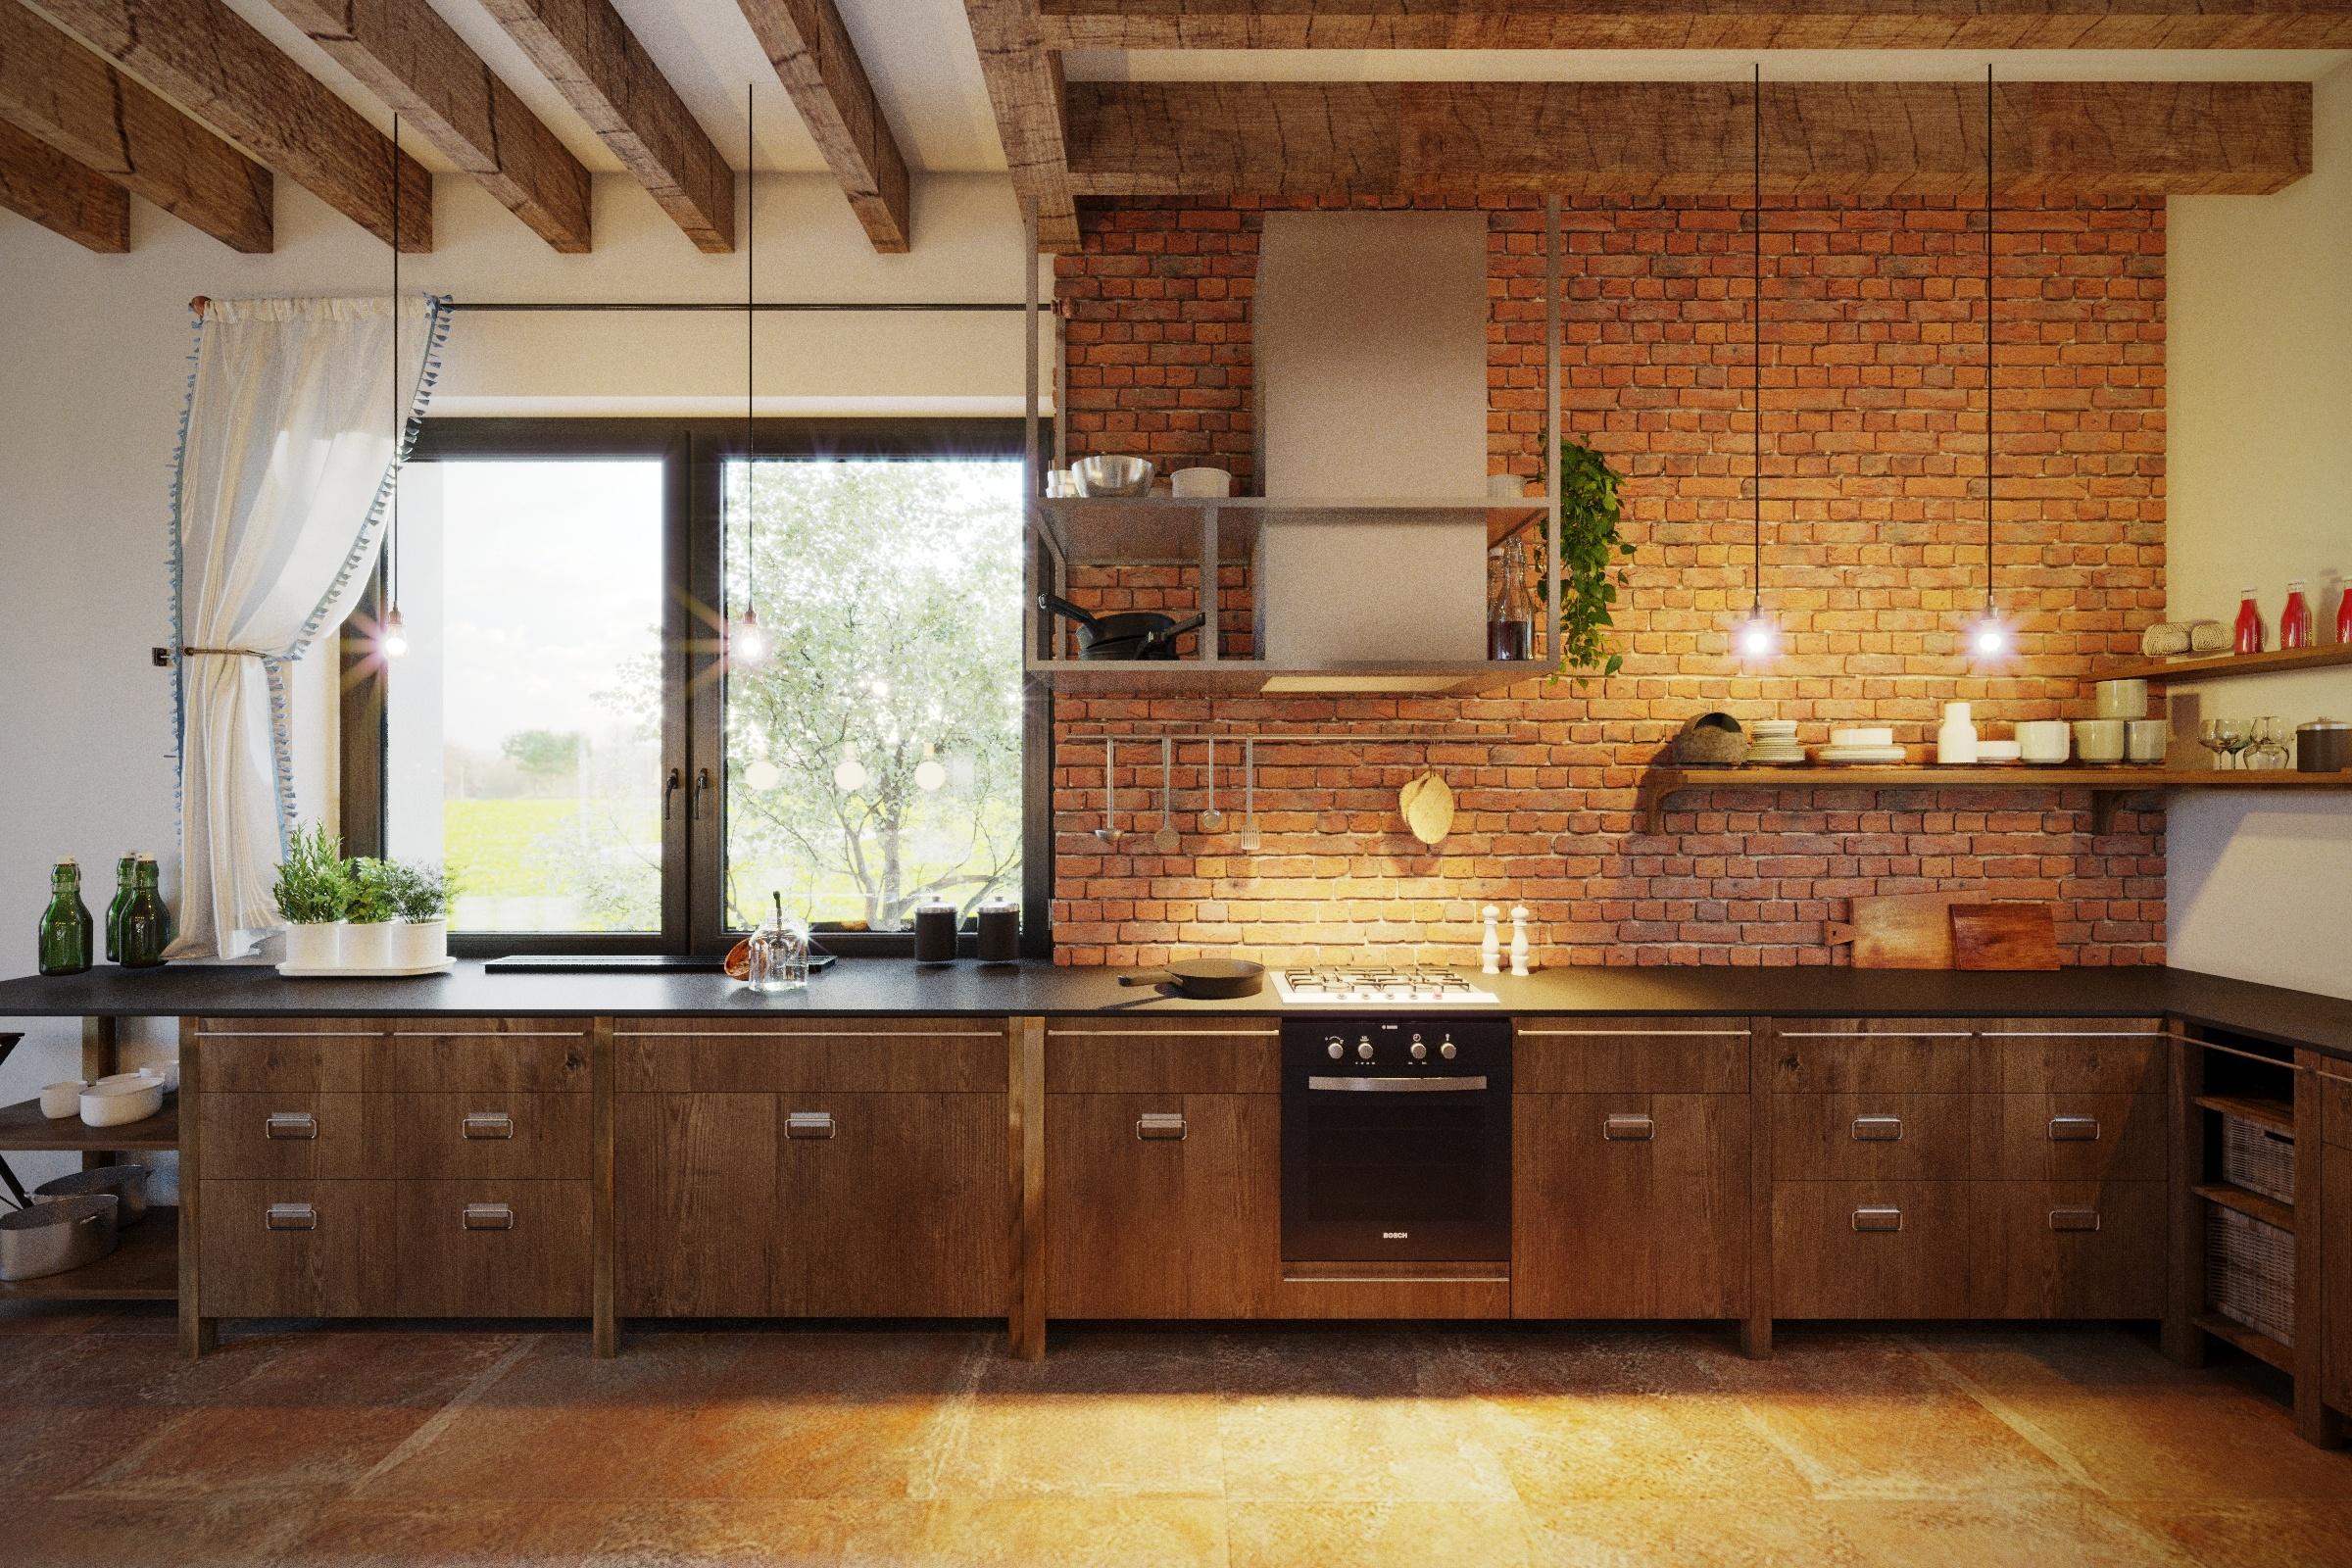 kitchen_interactive_lightmix_view07_01